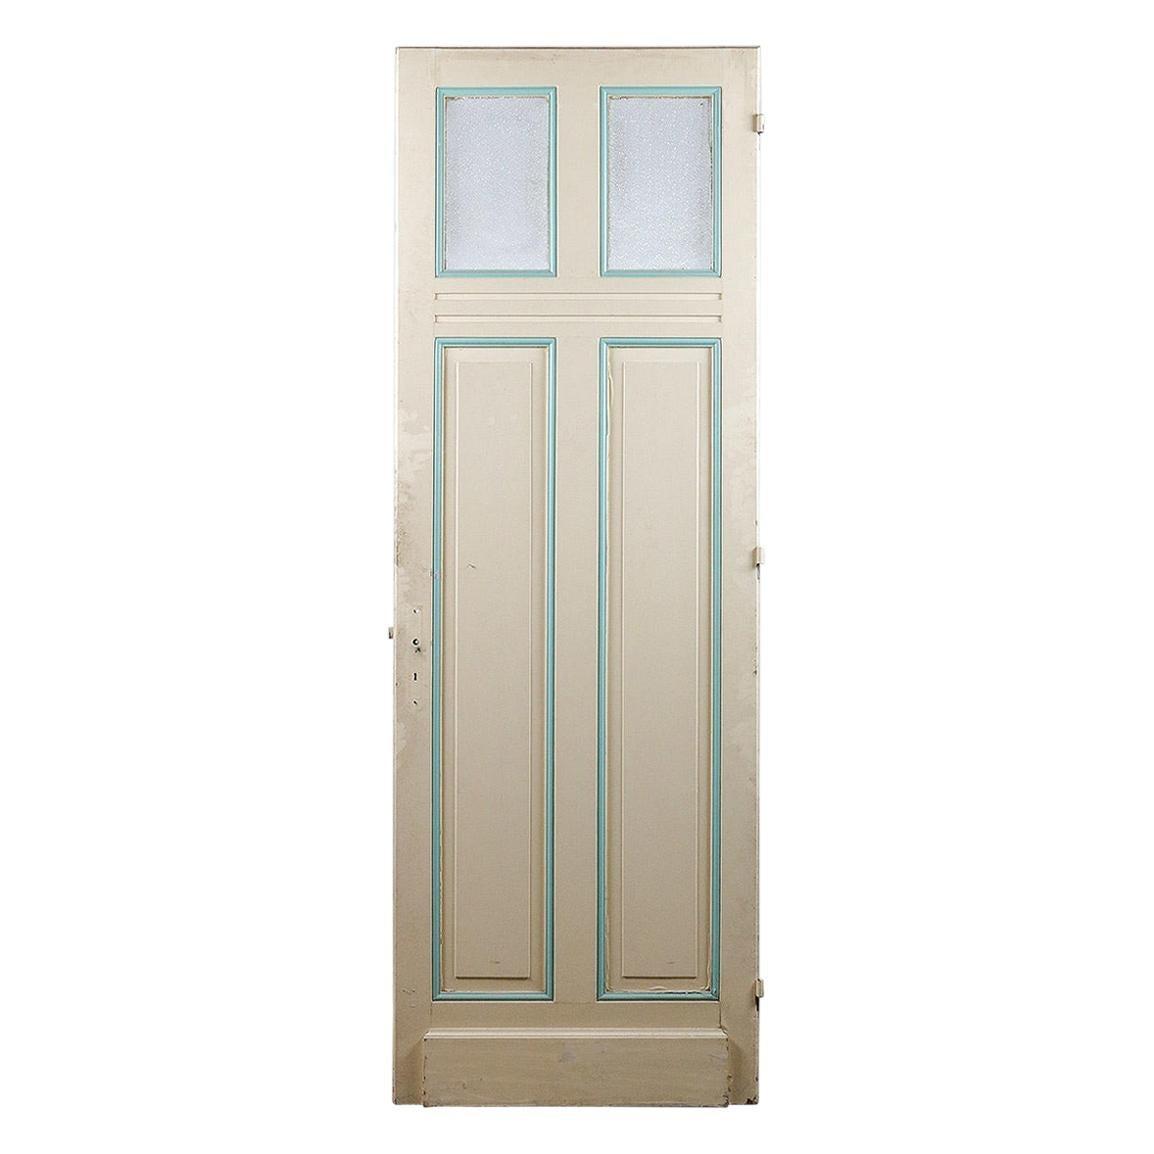 Pine Glazed Internal Door from France, 20th Century